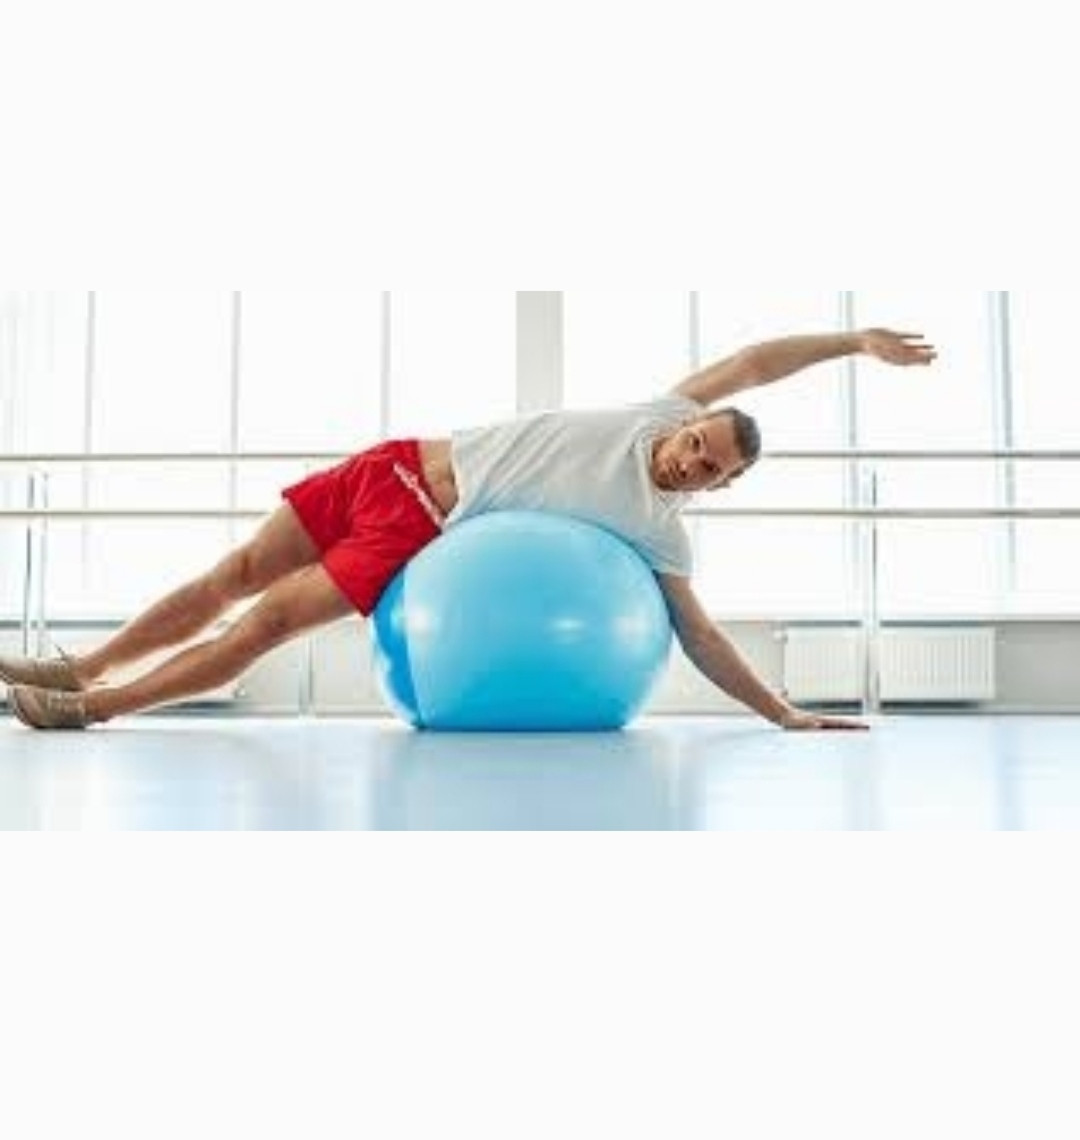 Мяч гимнастический (Фитбол) 85 см - фото 5